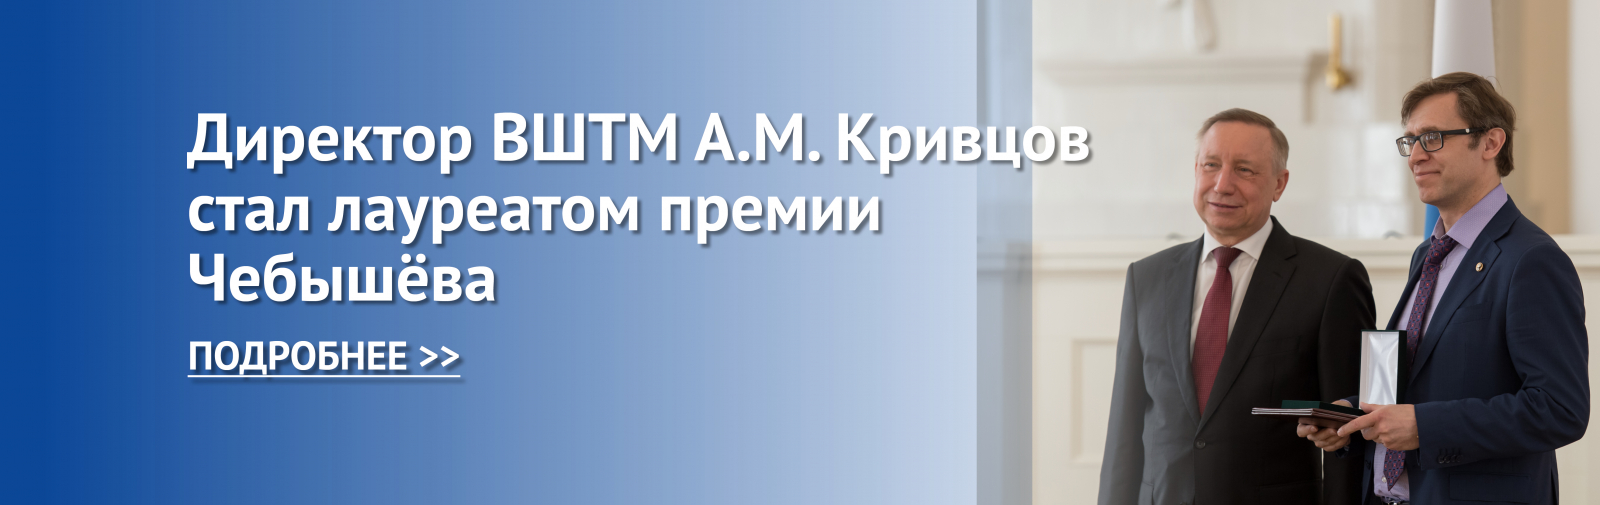 Премия Чебышёва